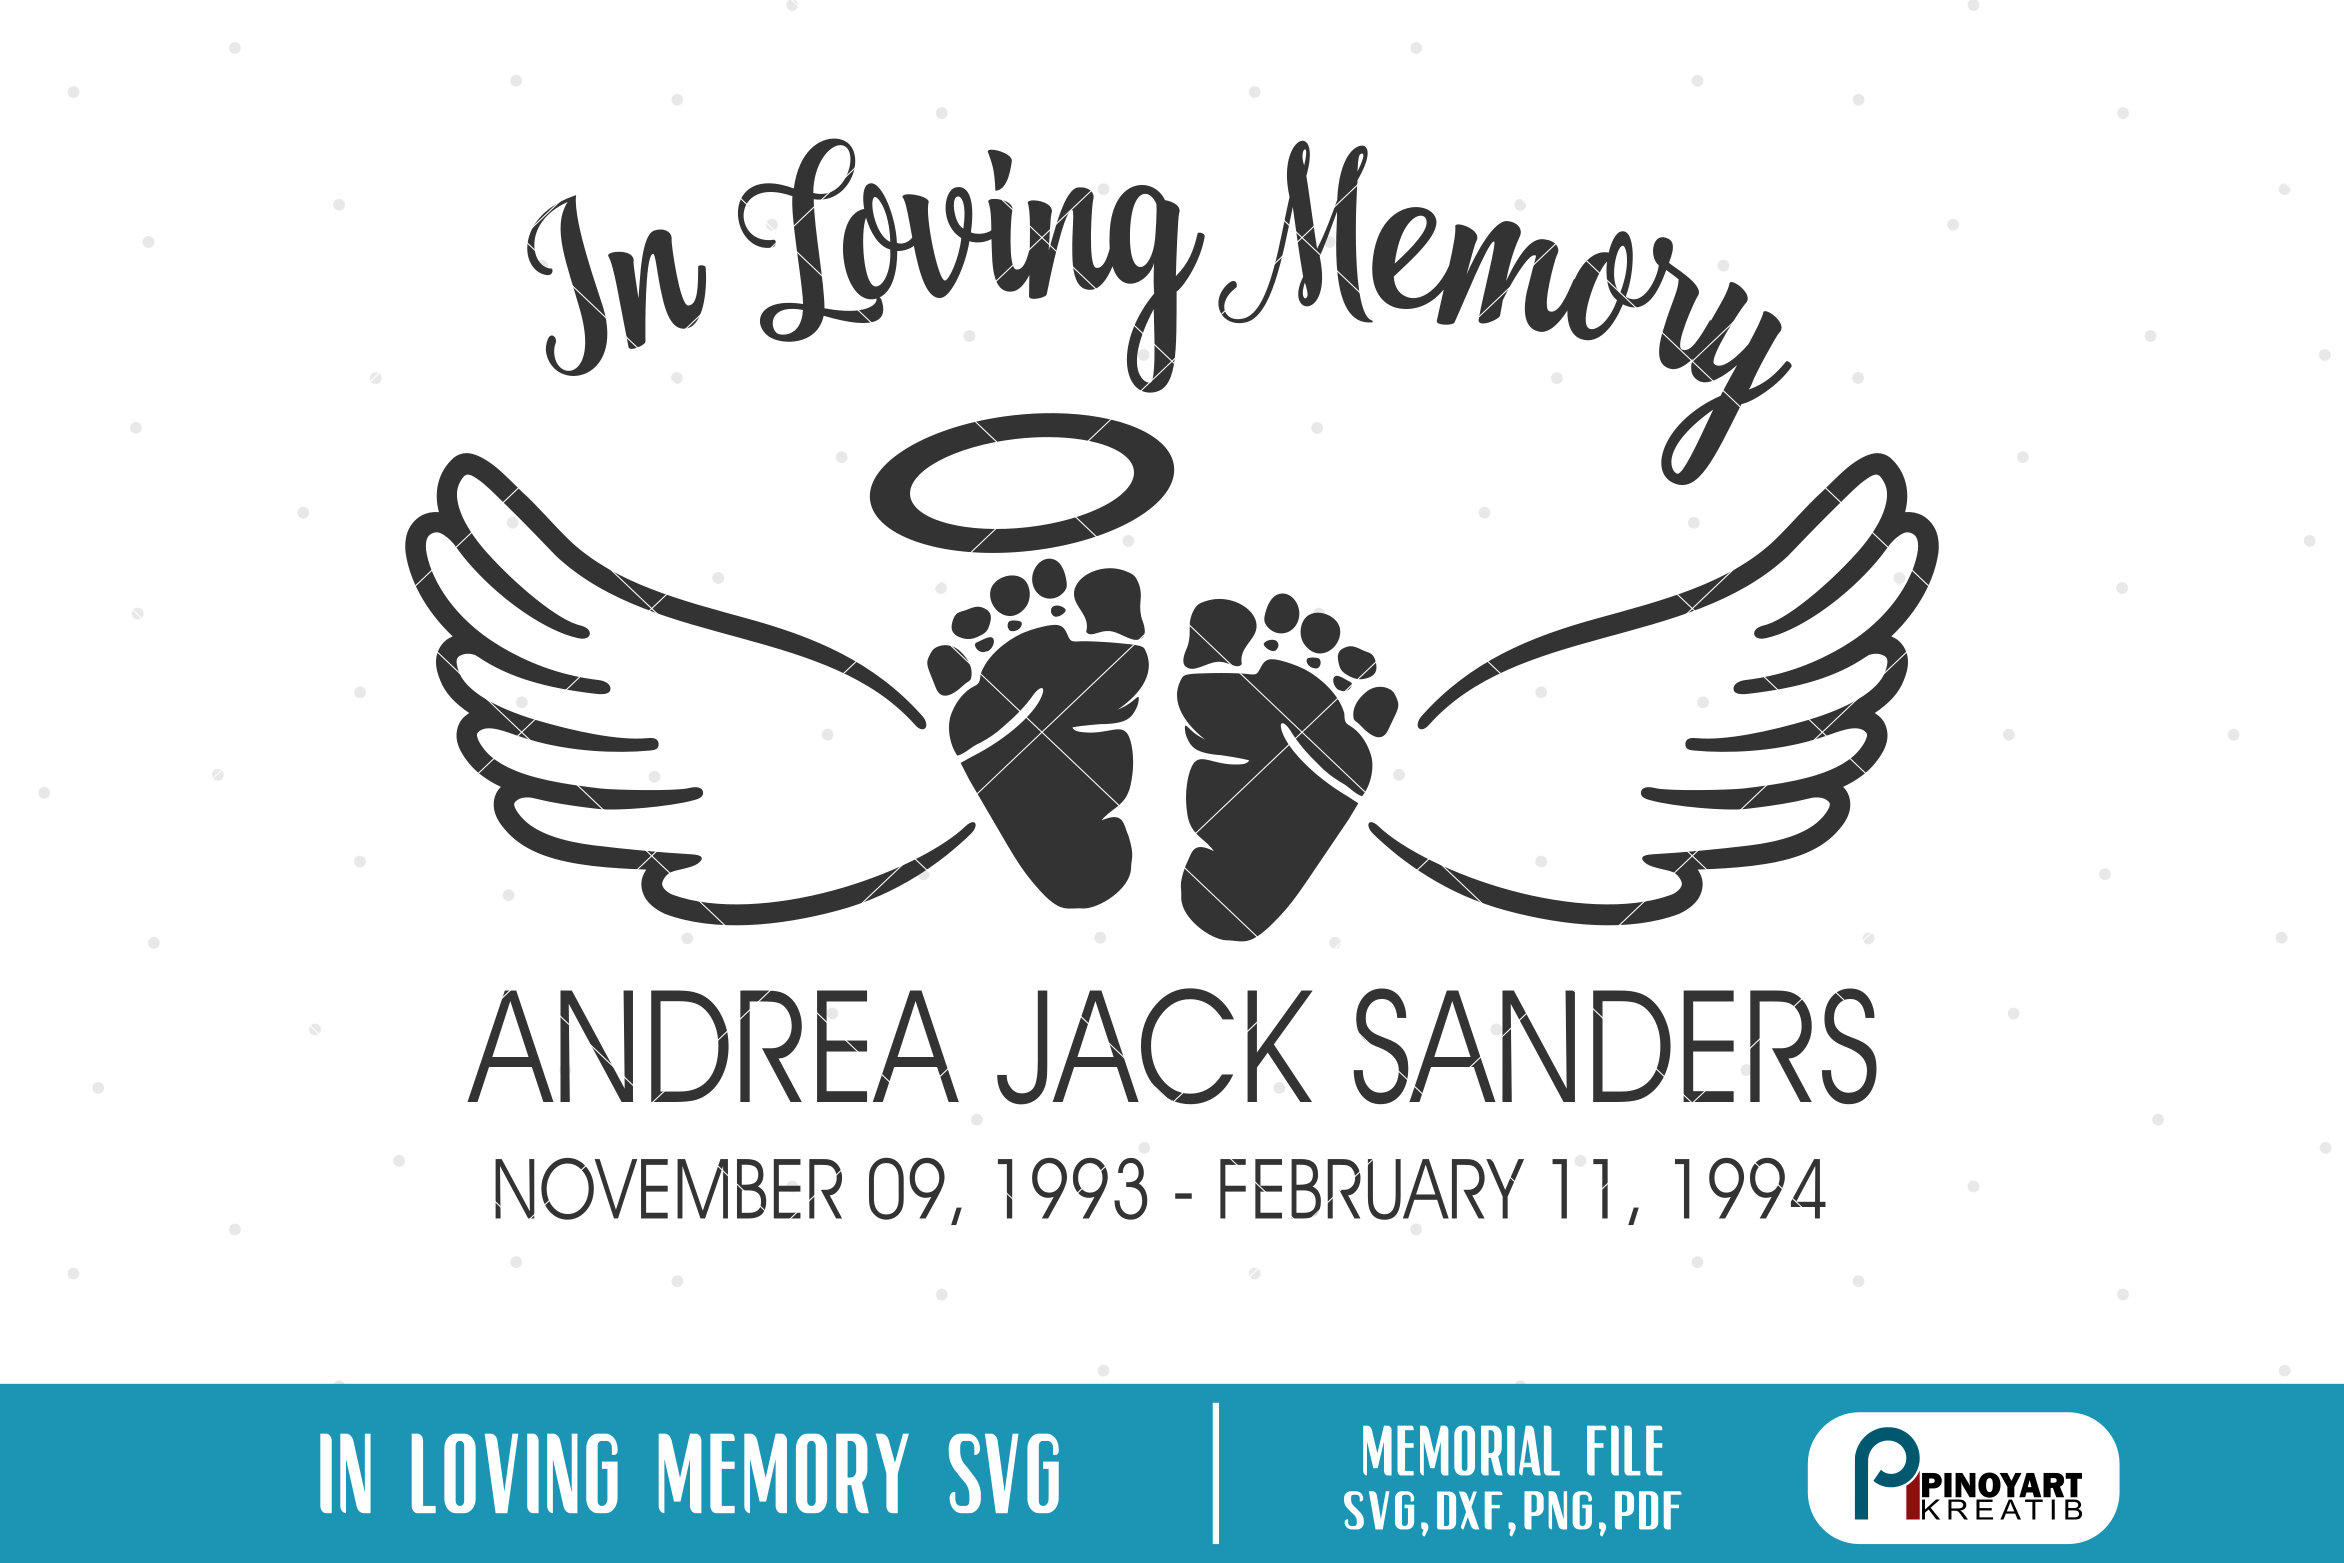 In Loving Memory svg, Baby Memorial Svg, Baby Angel Svg, Baby Svg, Angel  Svg, Angel Wings Svg, Baby Memorial Clip Art, Baby Angel Clip Art.